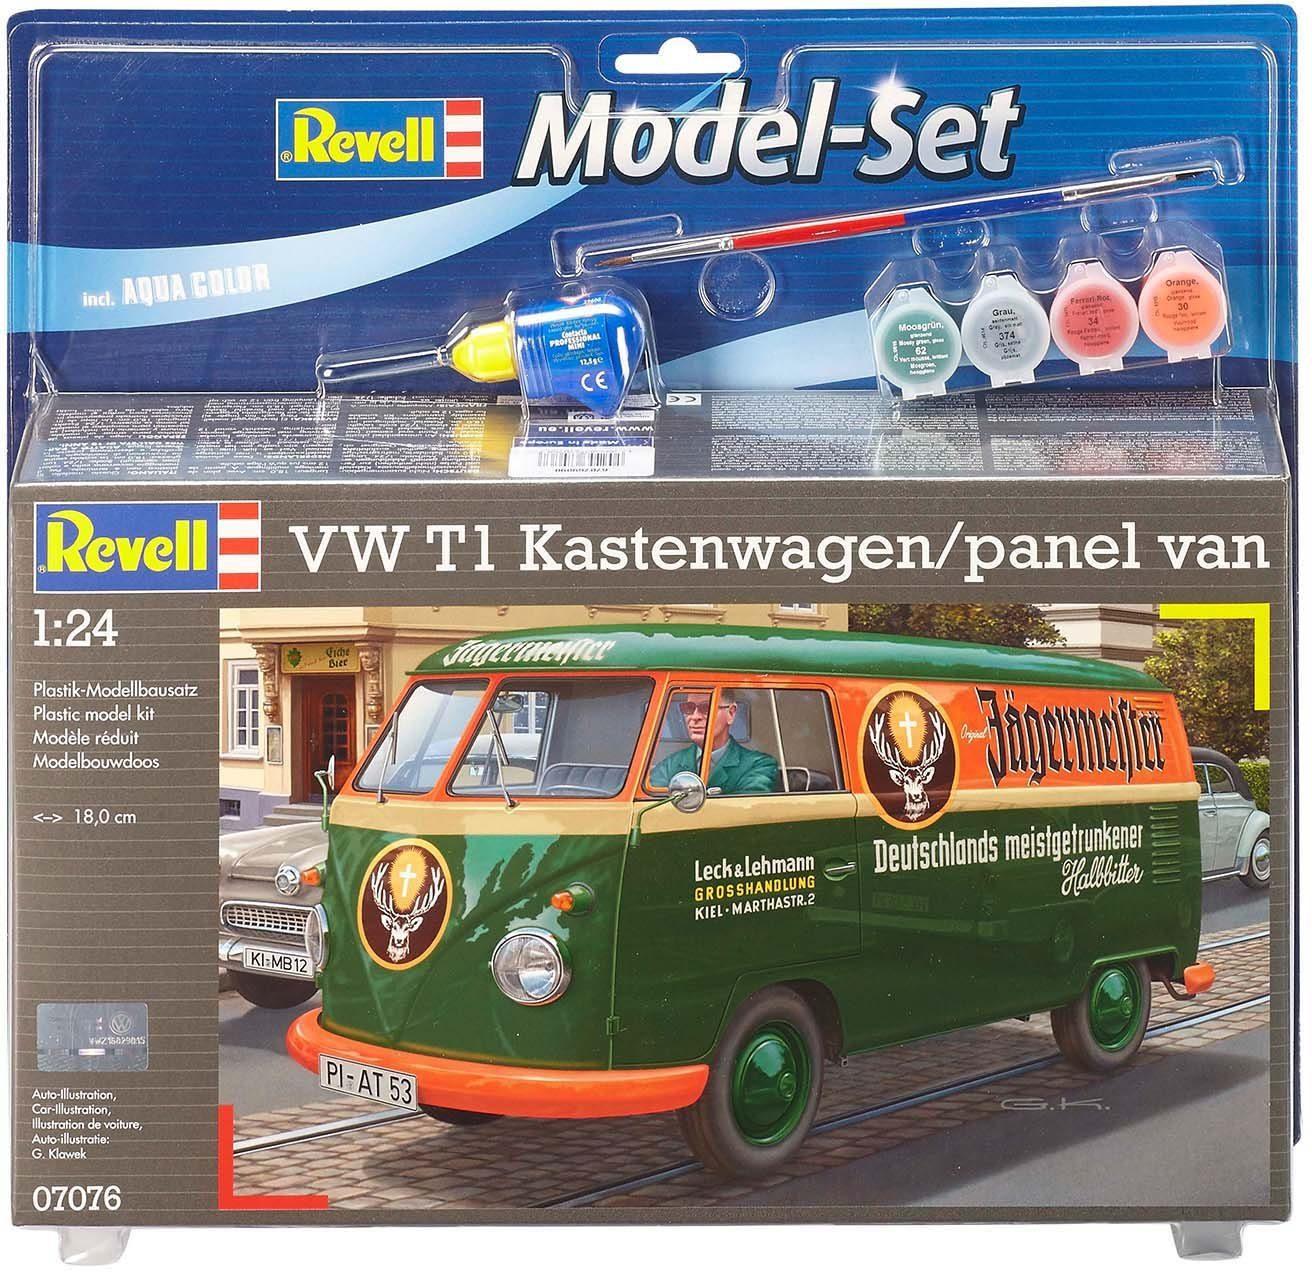 Revell Modellbausatz mit Zubehör, Maßstab 1:24, »Model Set, VW T1 Kastenwagen«